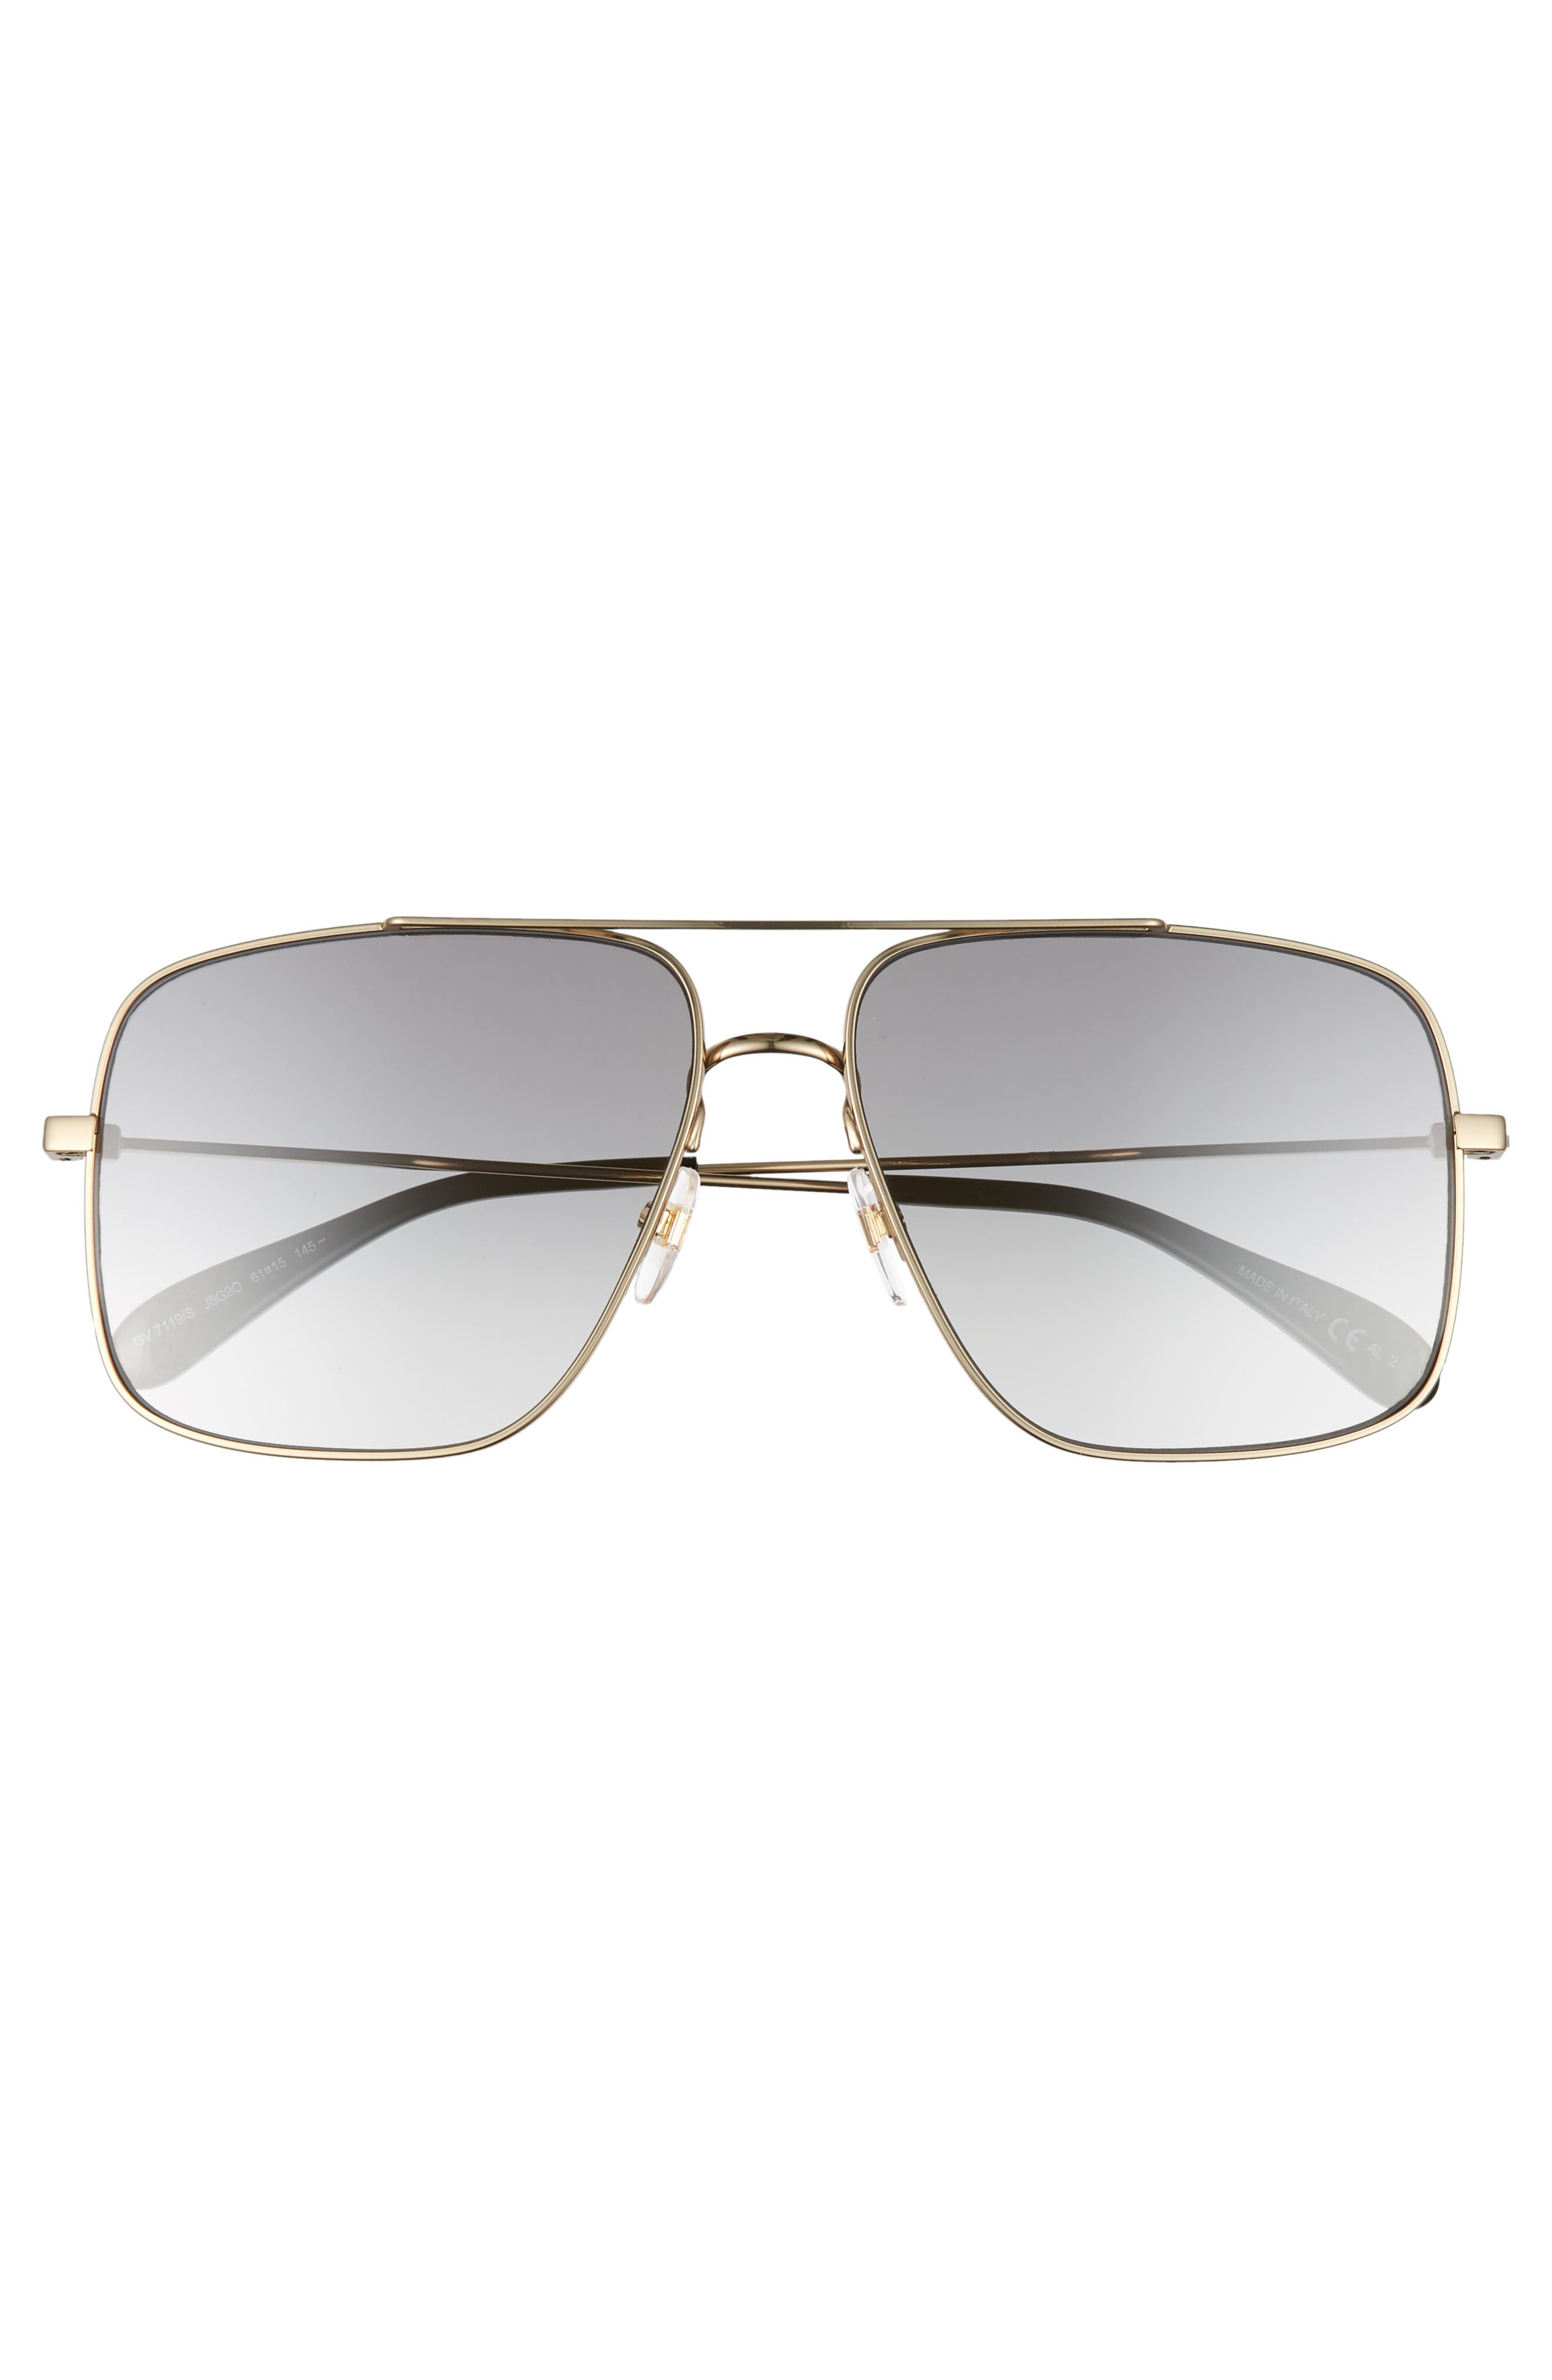 61mm Navigator Sunglasses,                             Alternate thumbnail 3, color,                             GOLD/ GREY